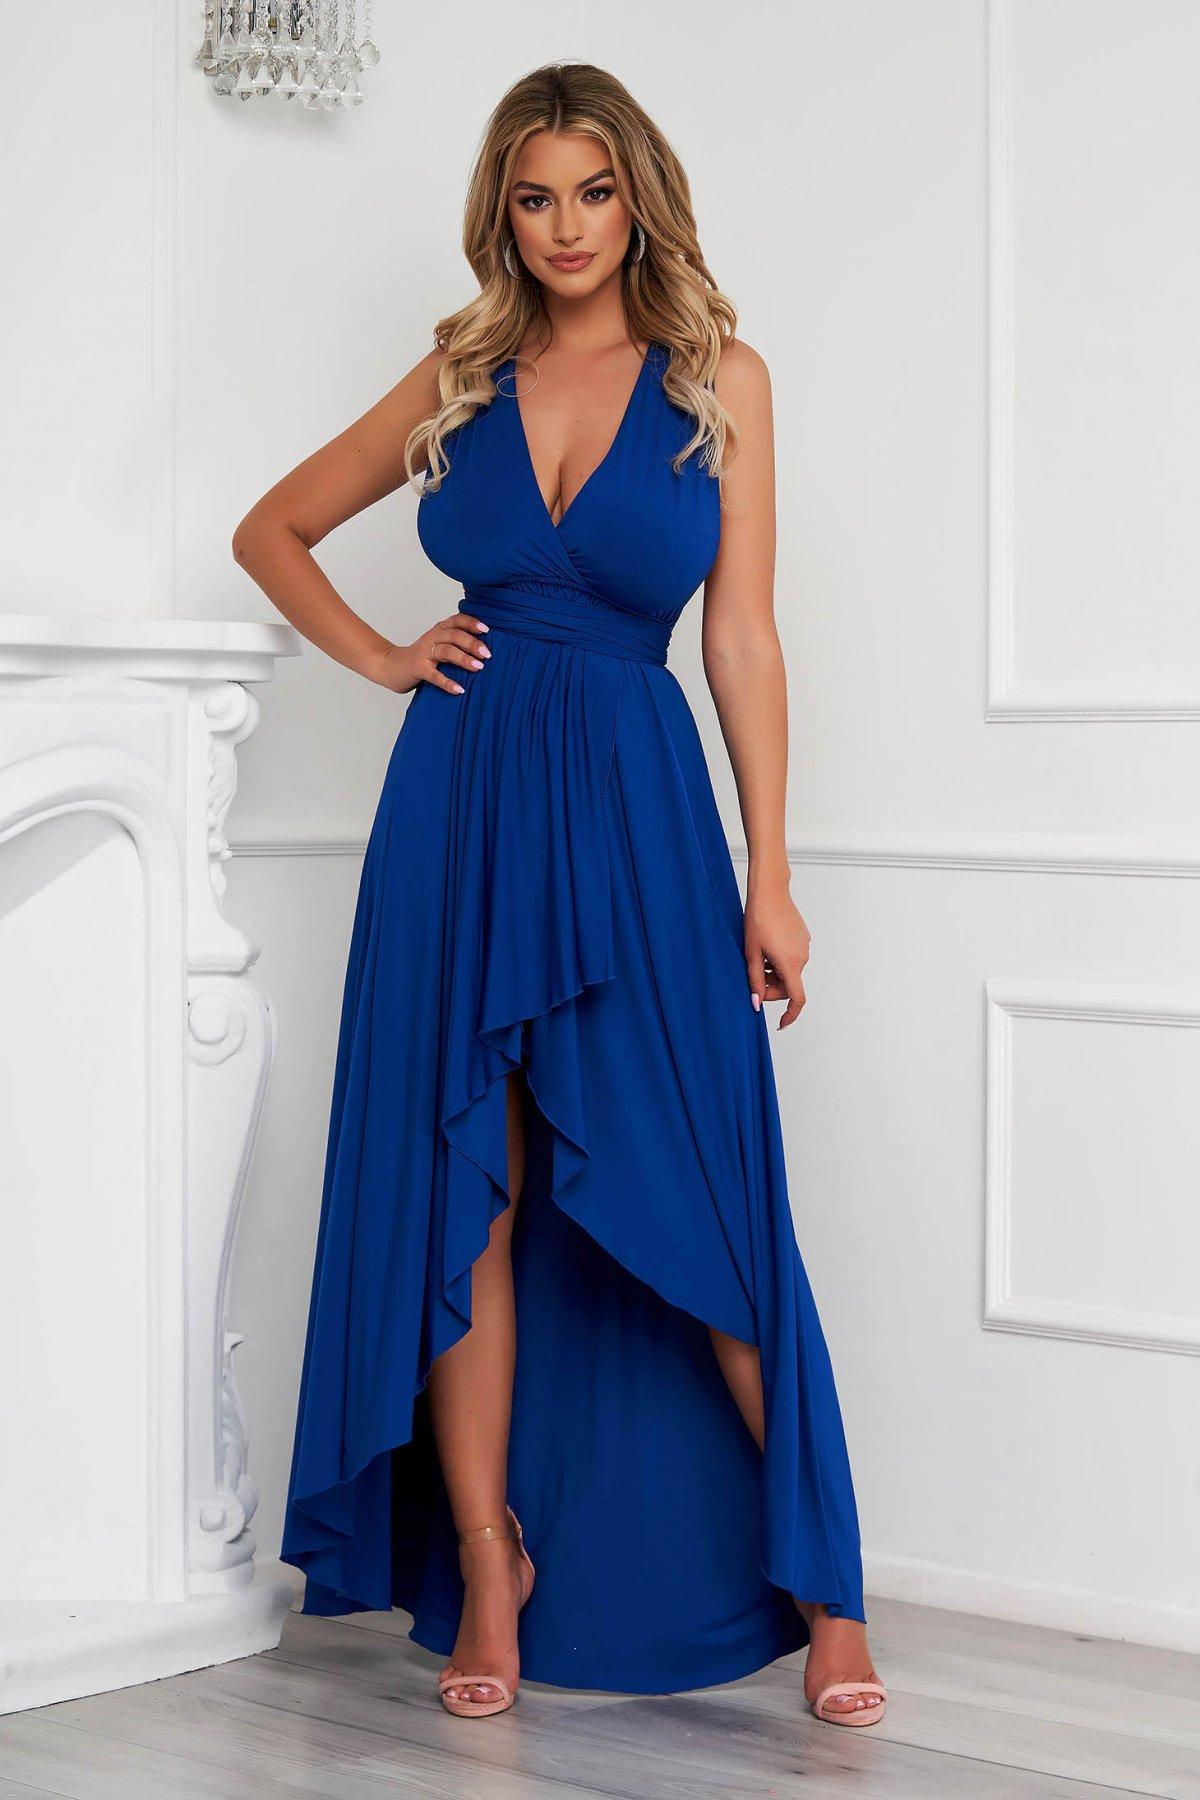 Rochie Lady Pandora albastra asimetrica de ocazie in clos din material elastic cu spatele gol